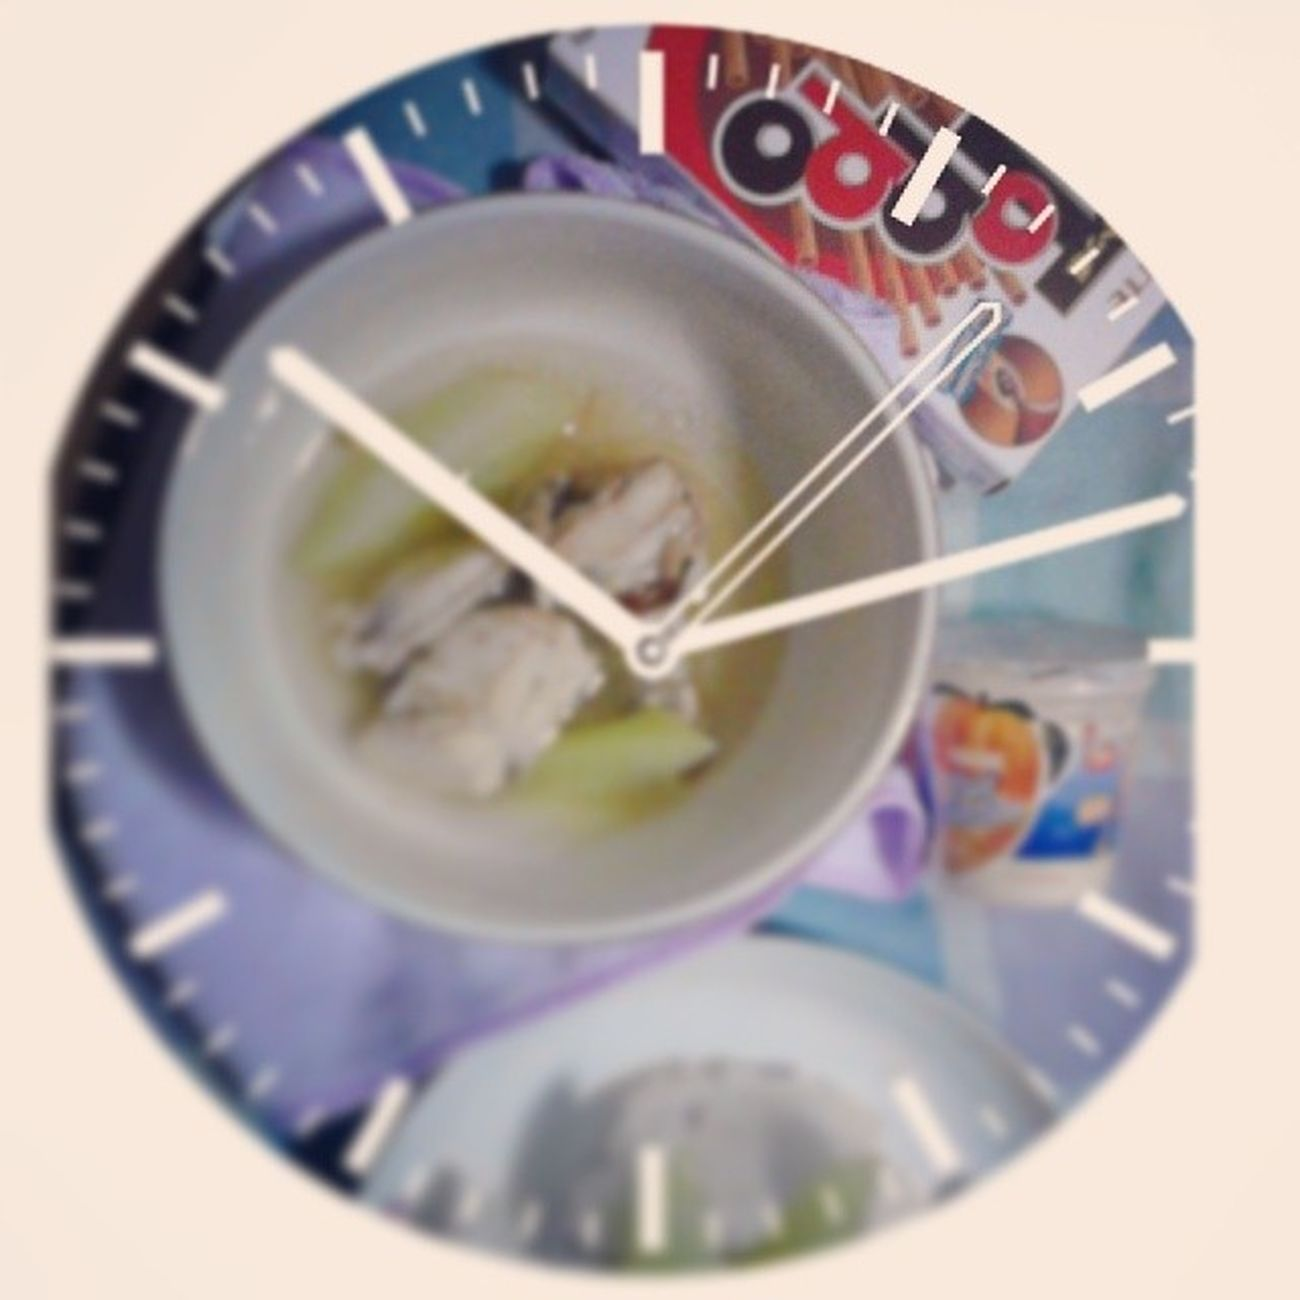 Jgh. Dinner kung dinner! Wala nang diet, diet! Di na uso yun! XD Tinola Rice TOPPO❤ PeachMangoYogurt mogumogu LAMON